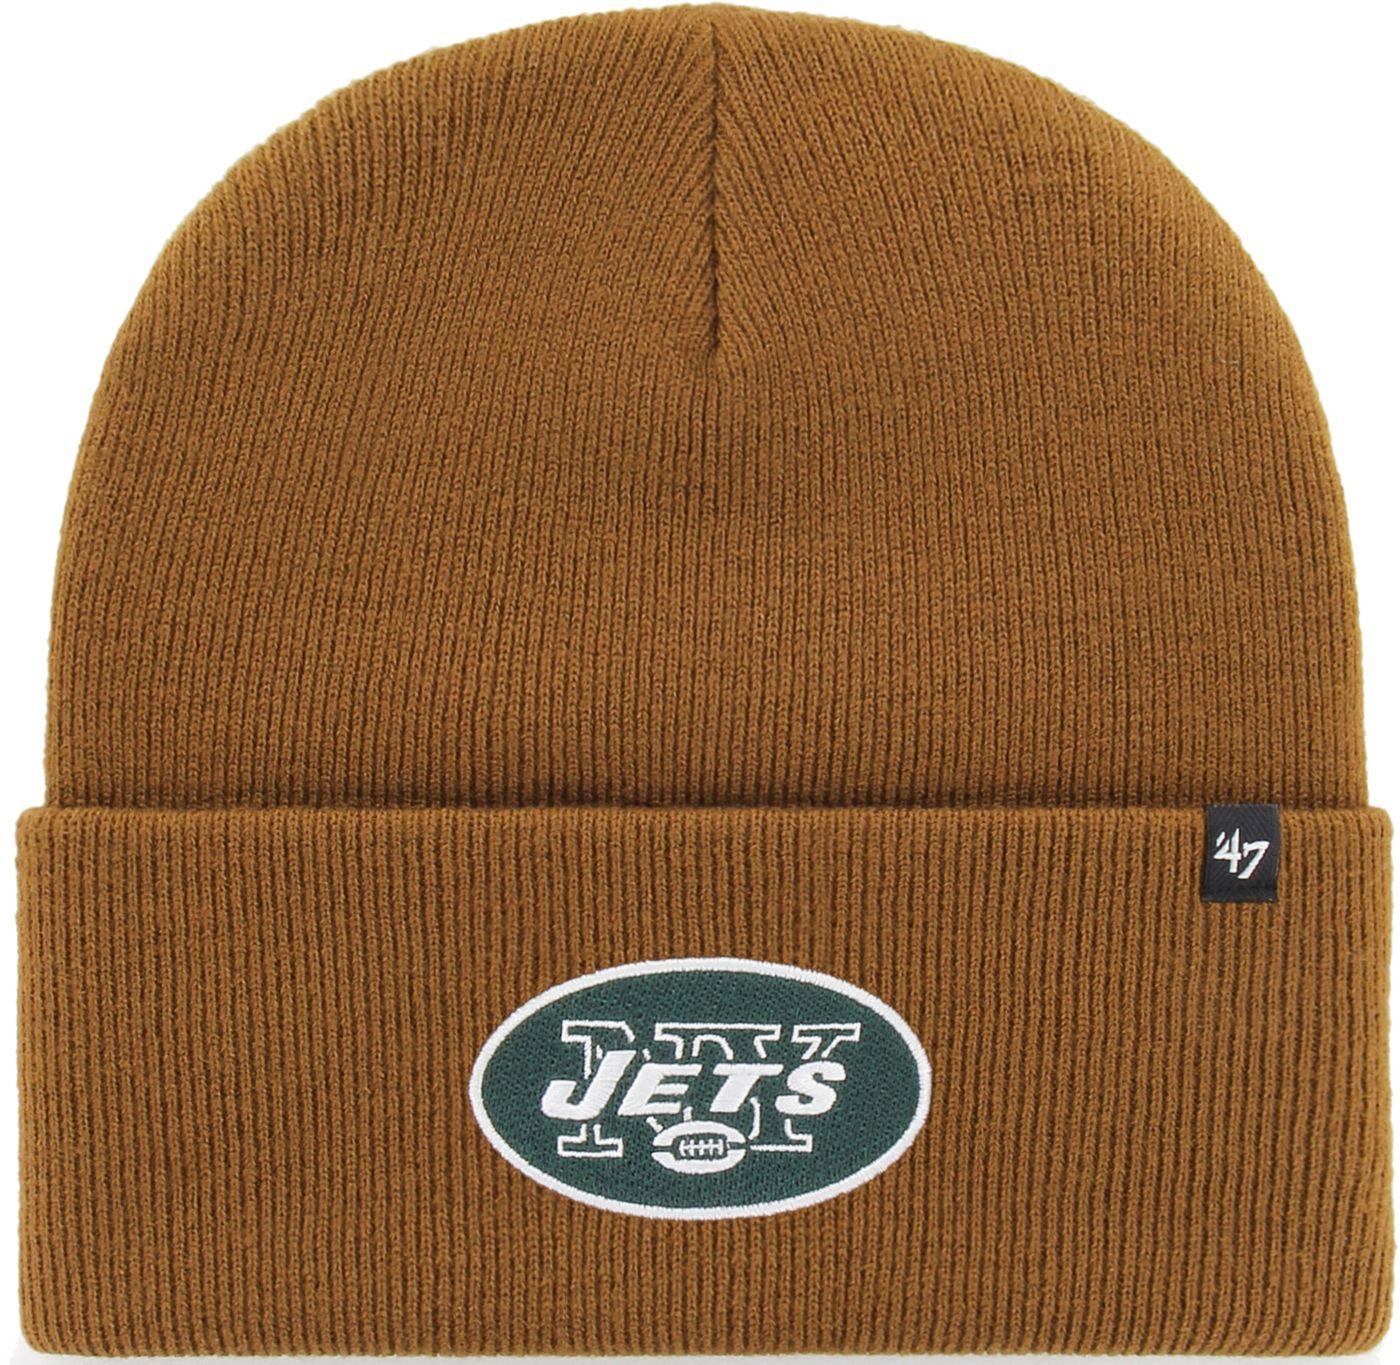 '47 Men's New York Jets Carhartt Brown Knit Hat